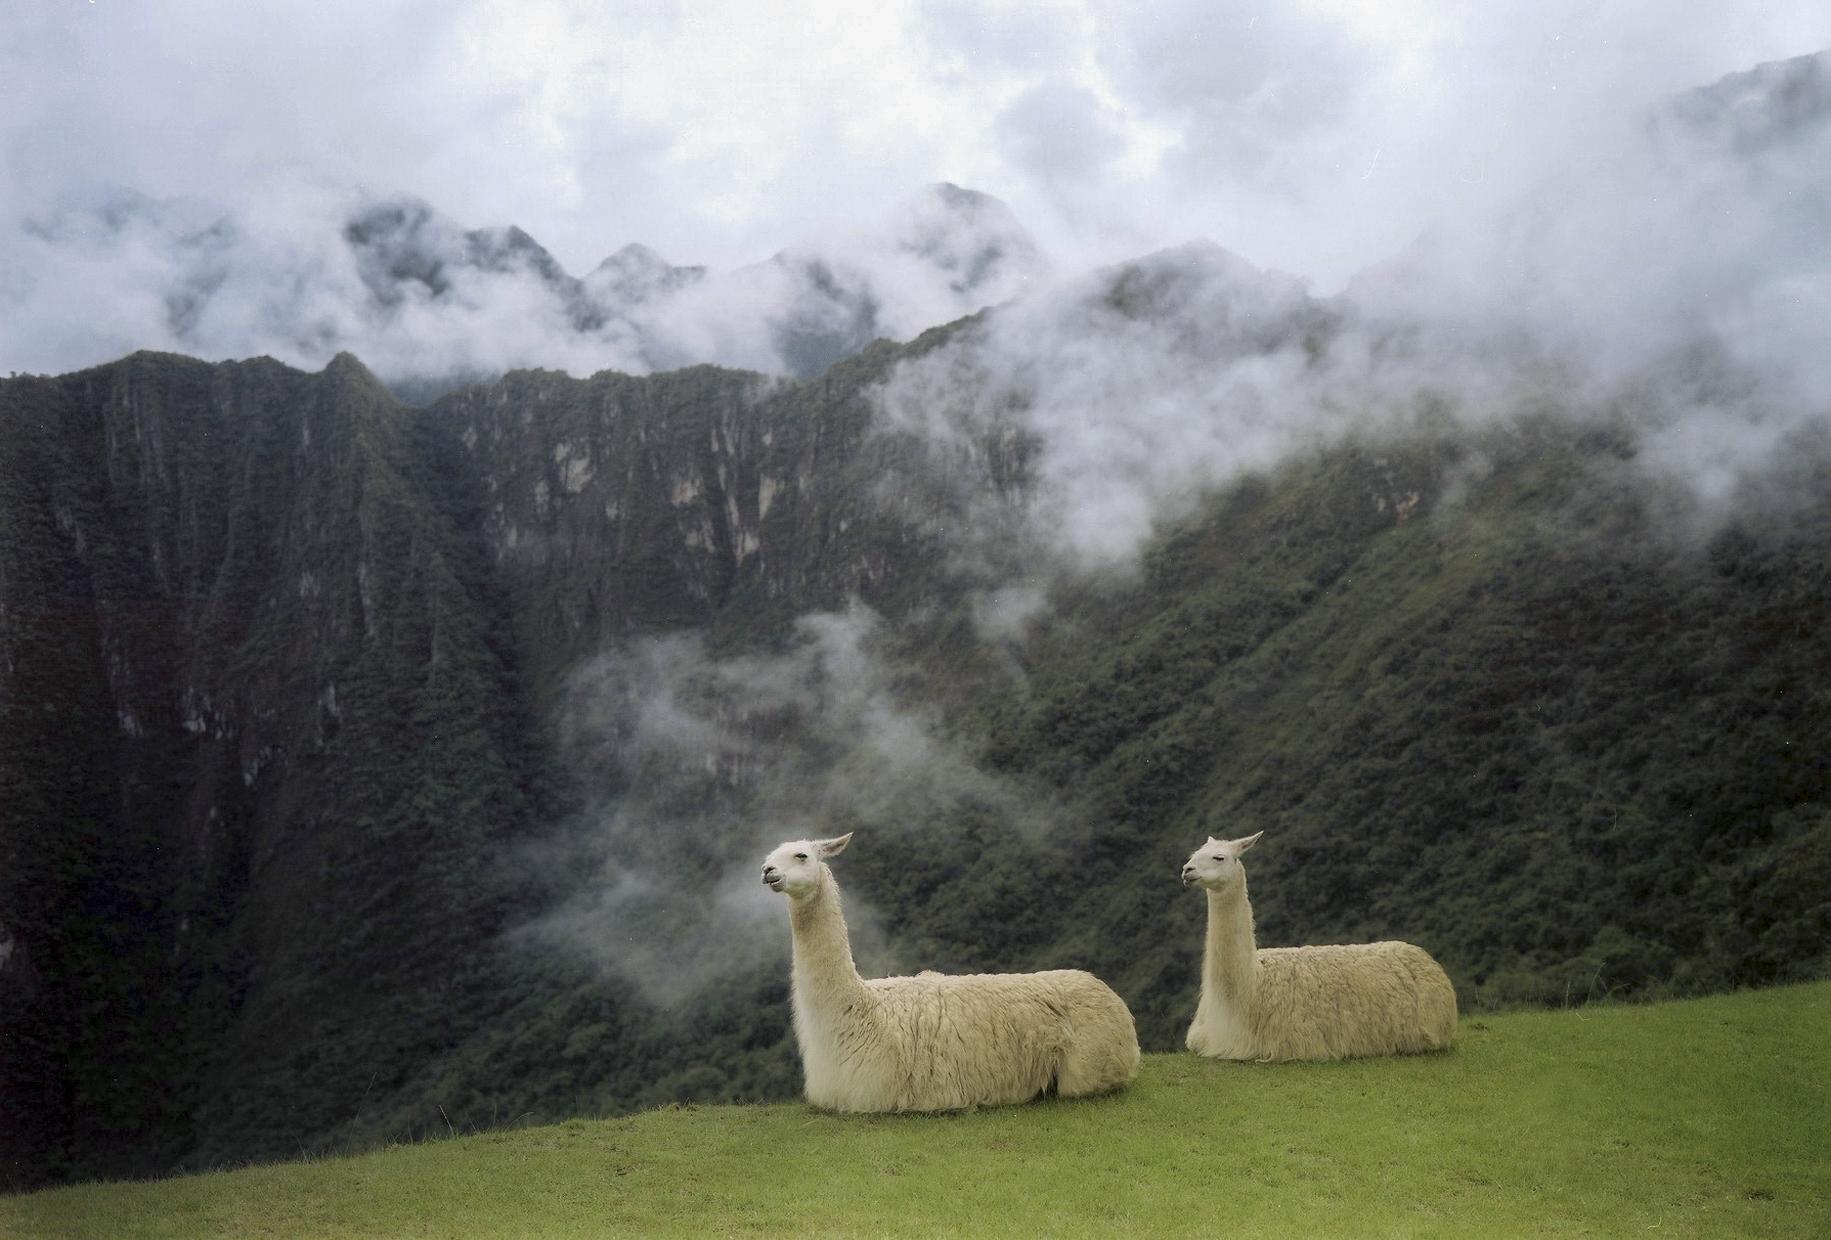 The Lamas of Machu Pichu, Peru